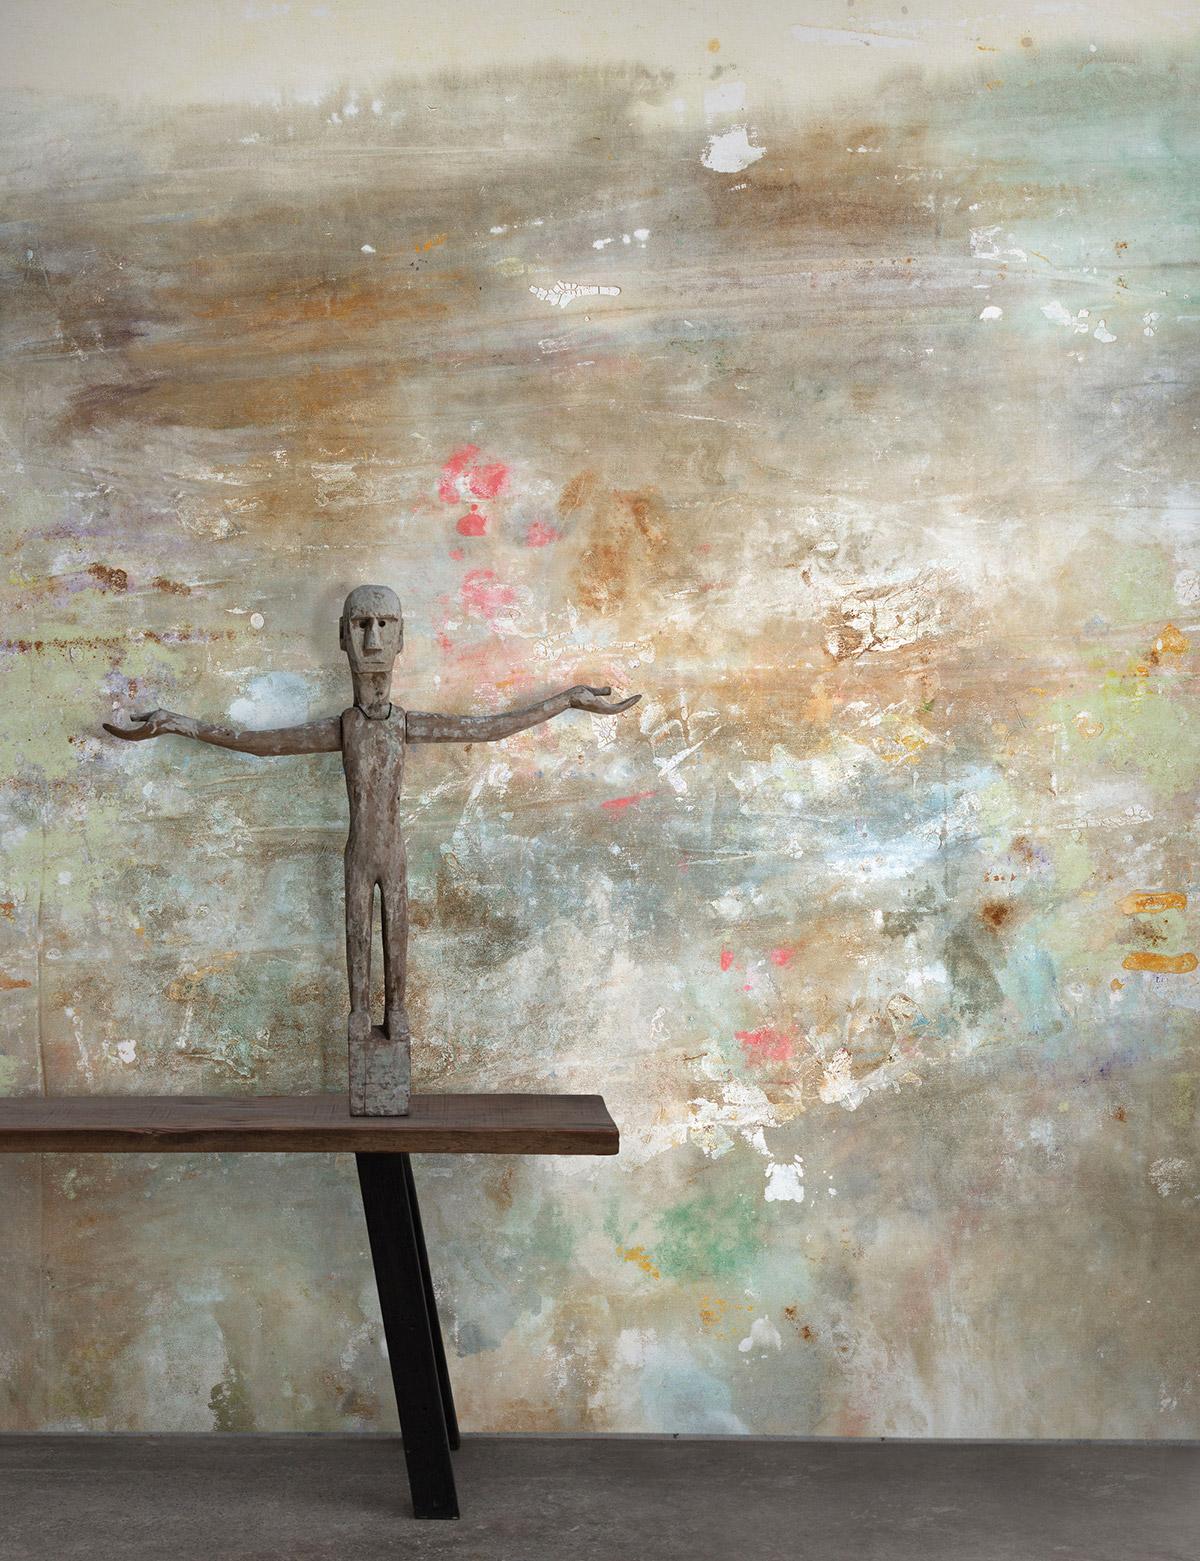 """OH LA LA Wallpaper"" by Kiki Slaughter for FEATHR"